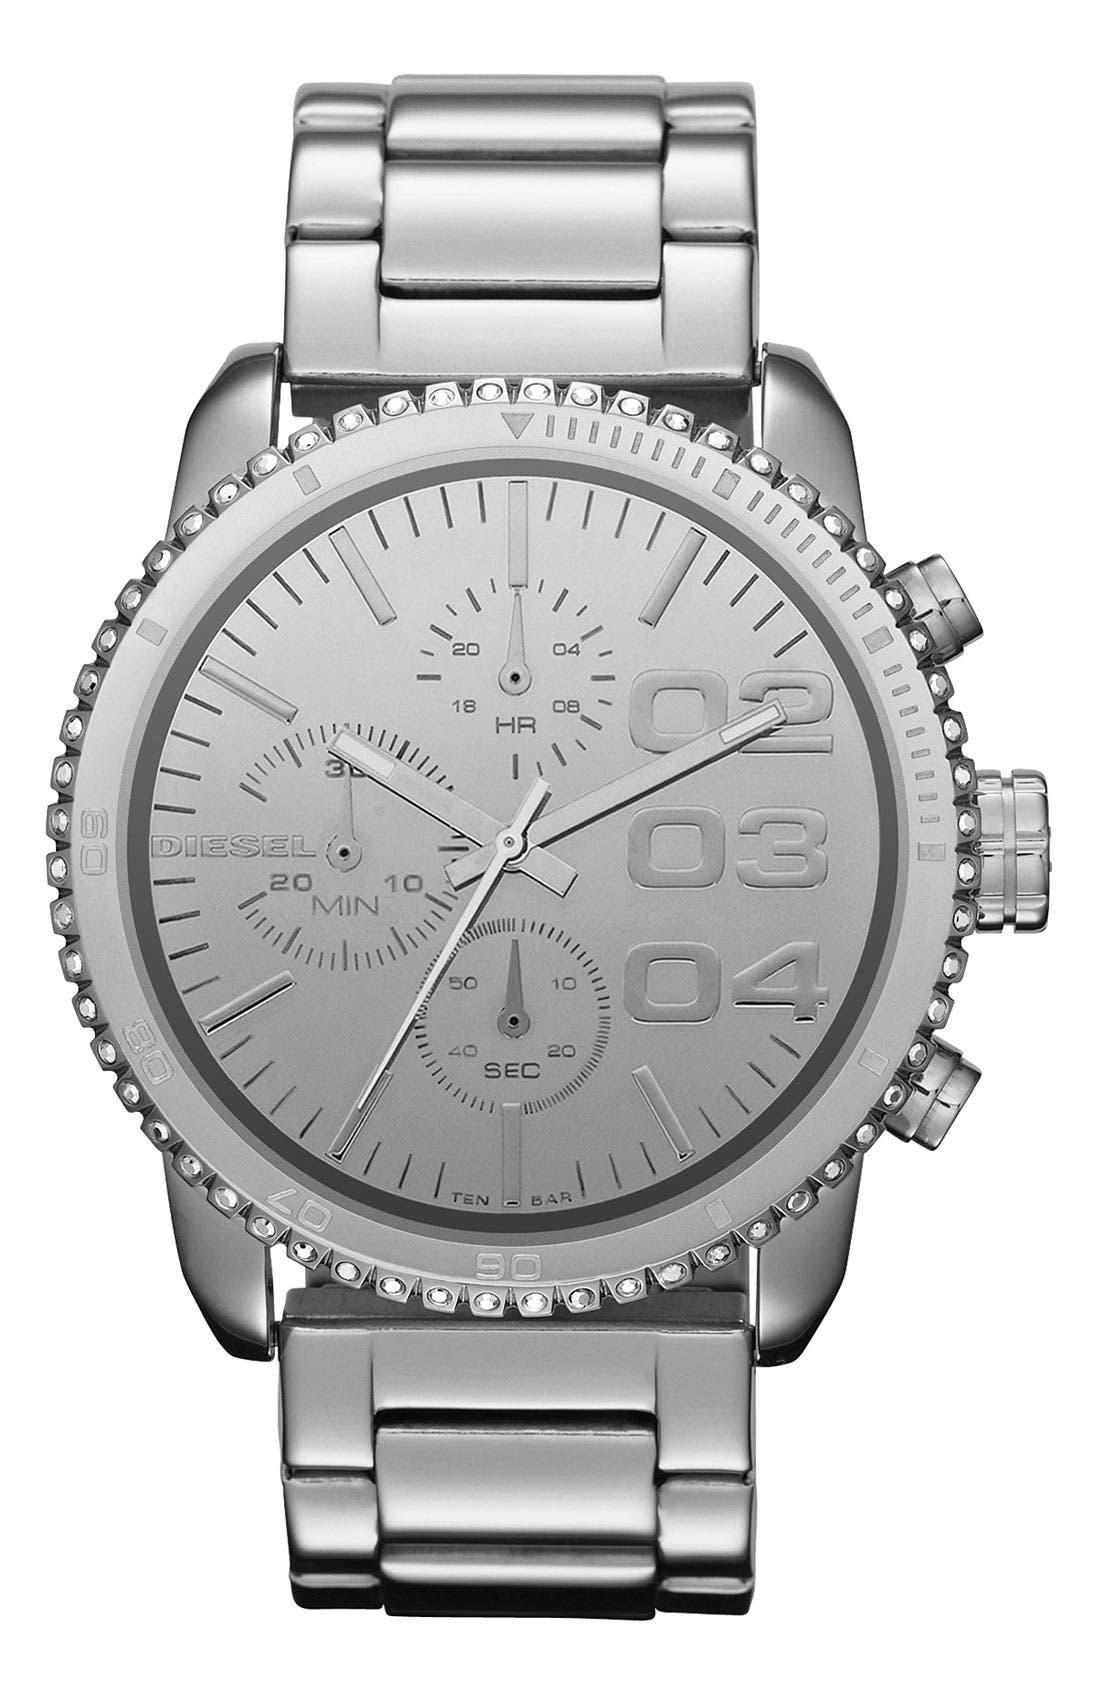 Alternate Image 1 Selected - DIESEL® 'Franchise' Chronograph Bracelet Watch, 42mm x 46mm